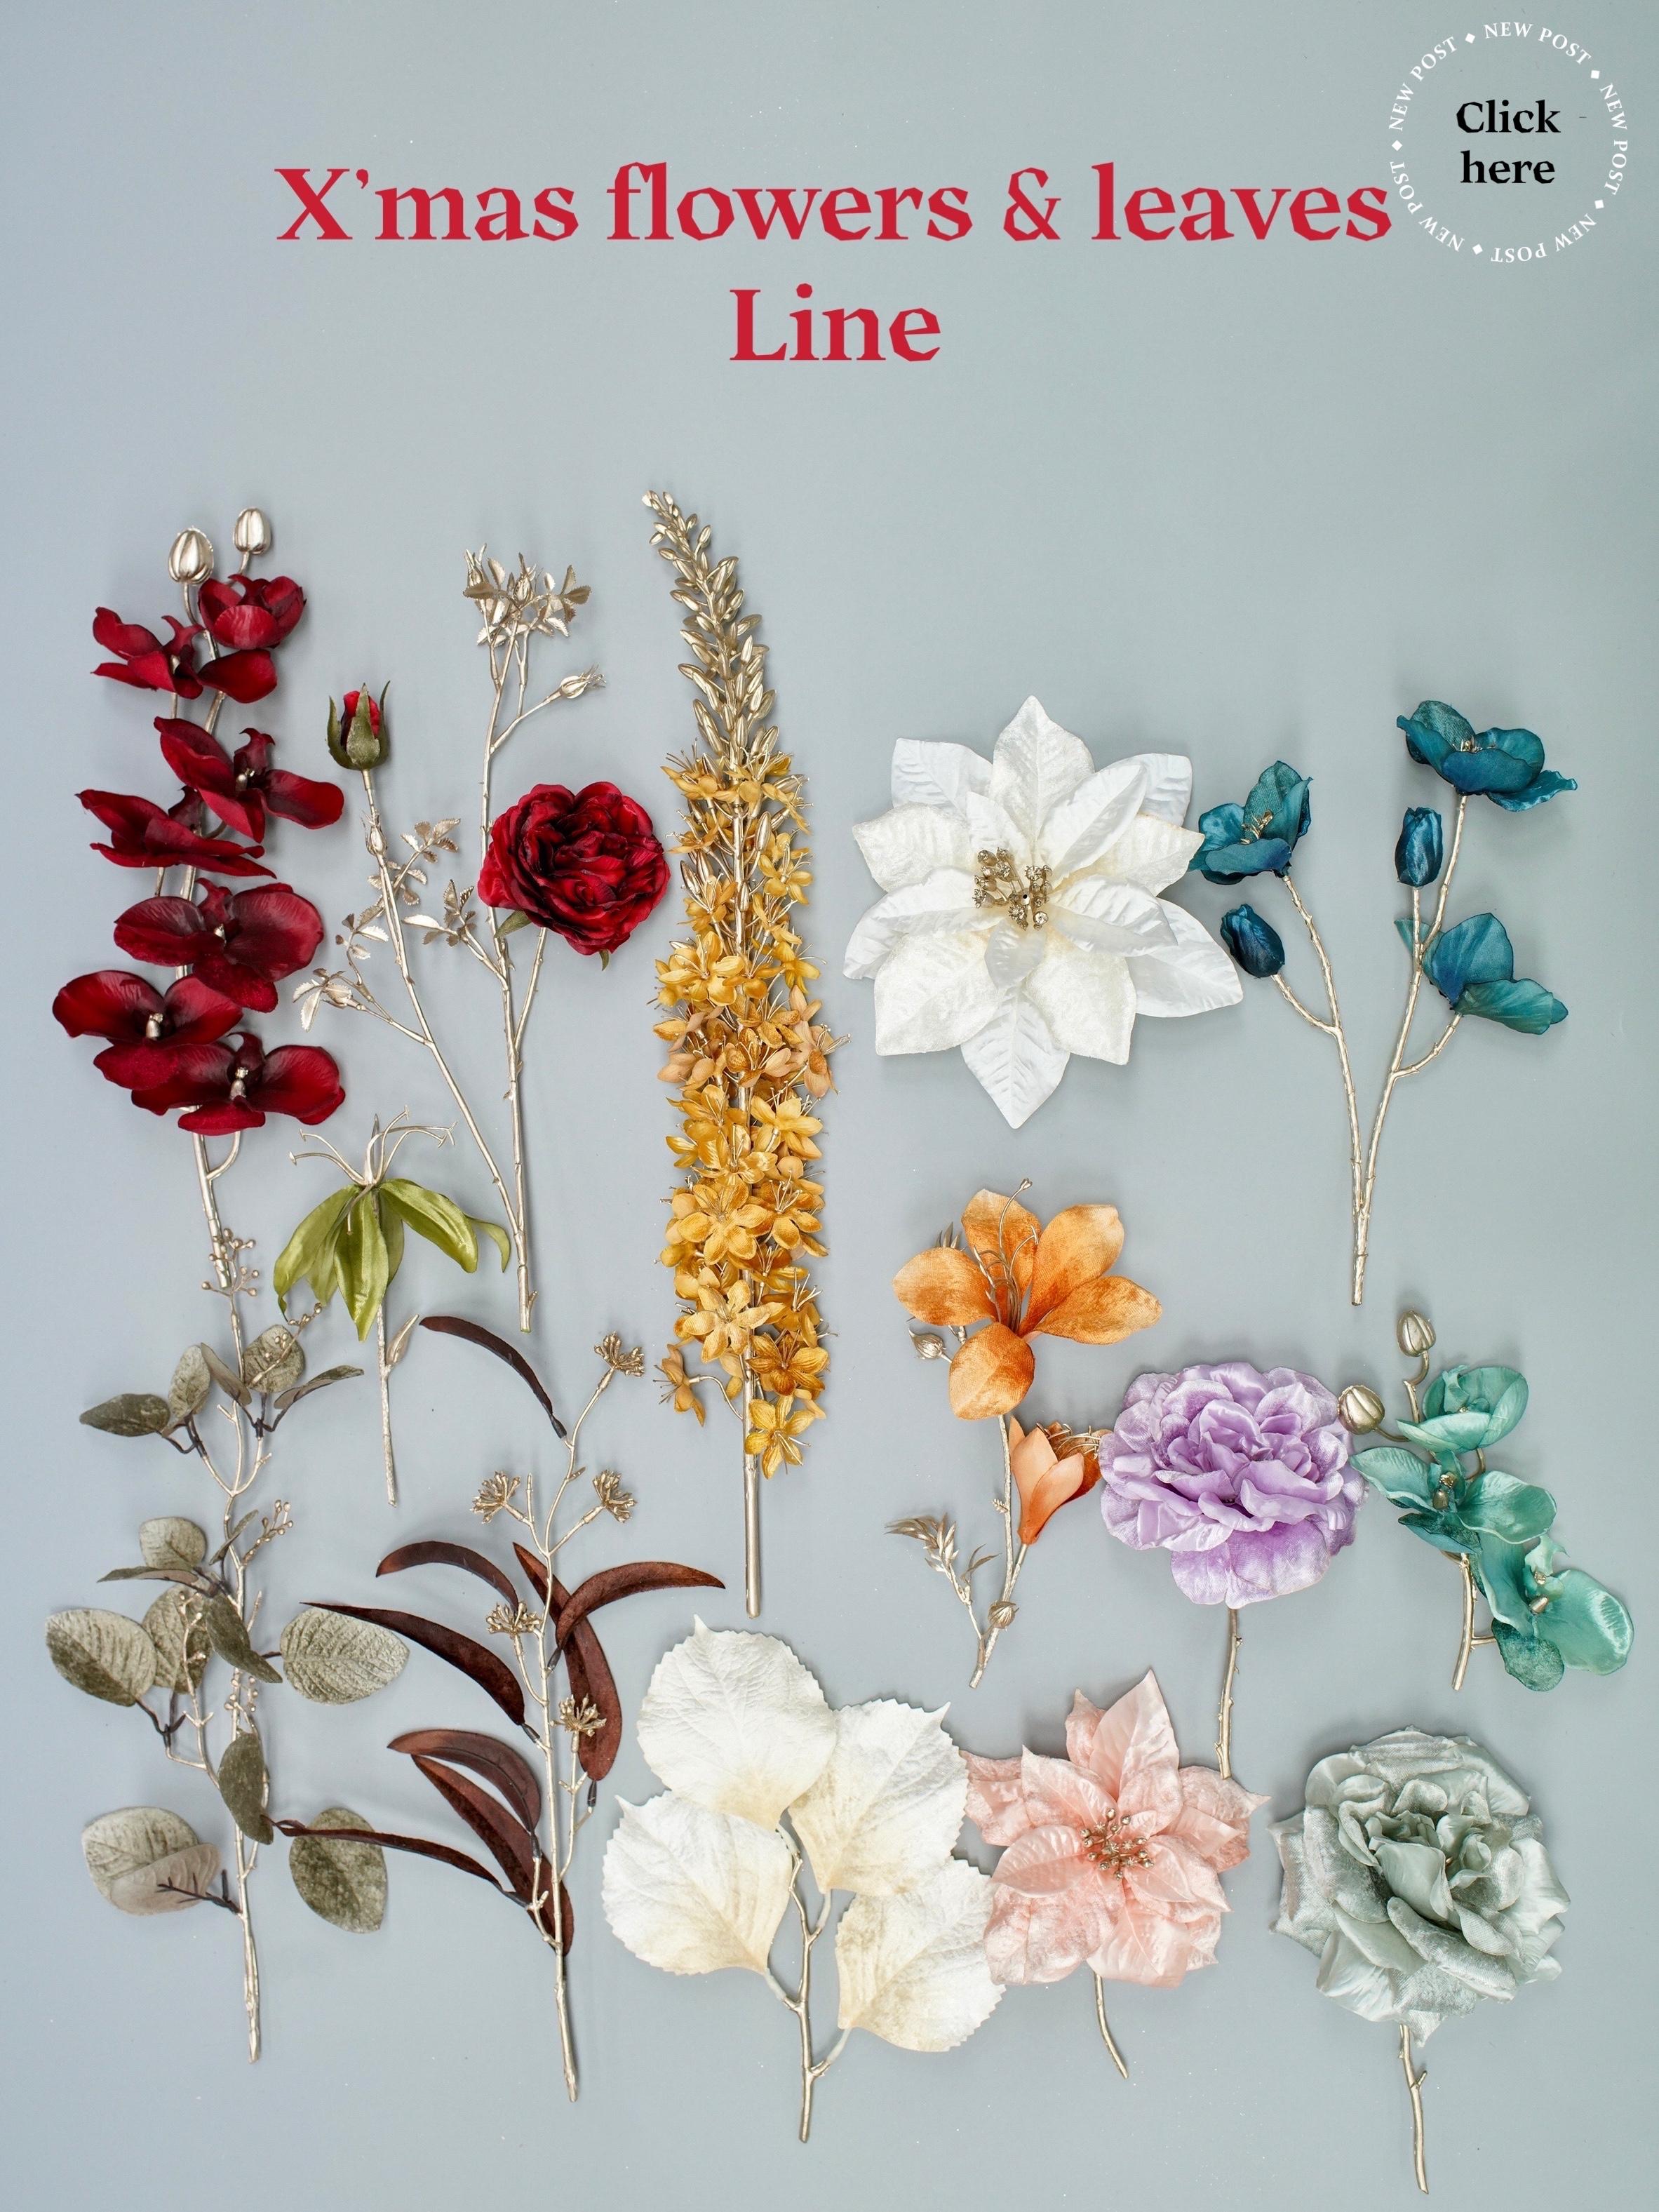 nc gardens hong kong artificial flowers fall collection banner